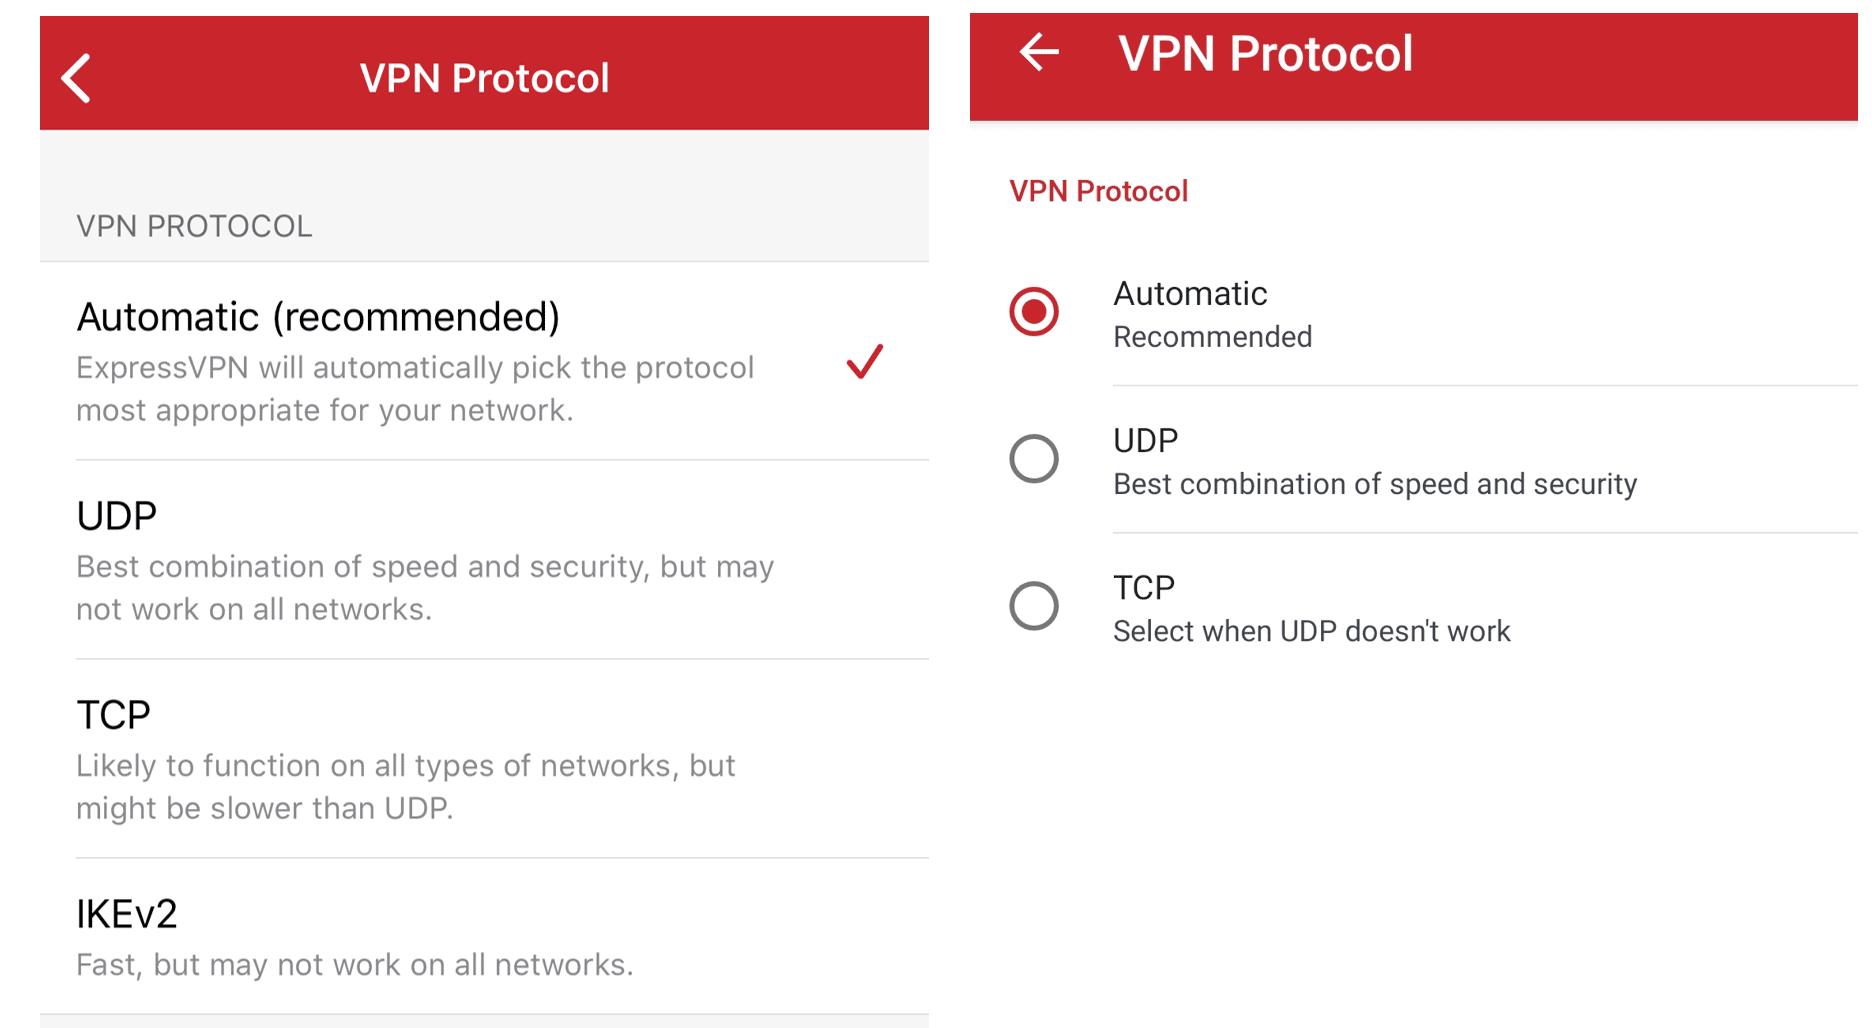 ExpressVPN protocol options